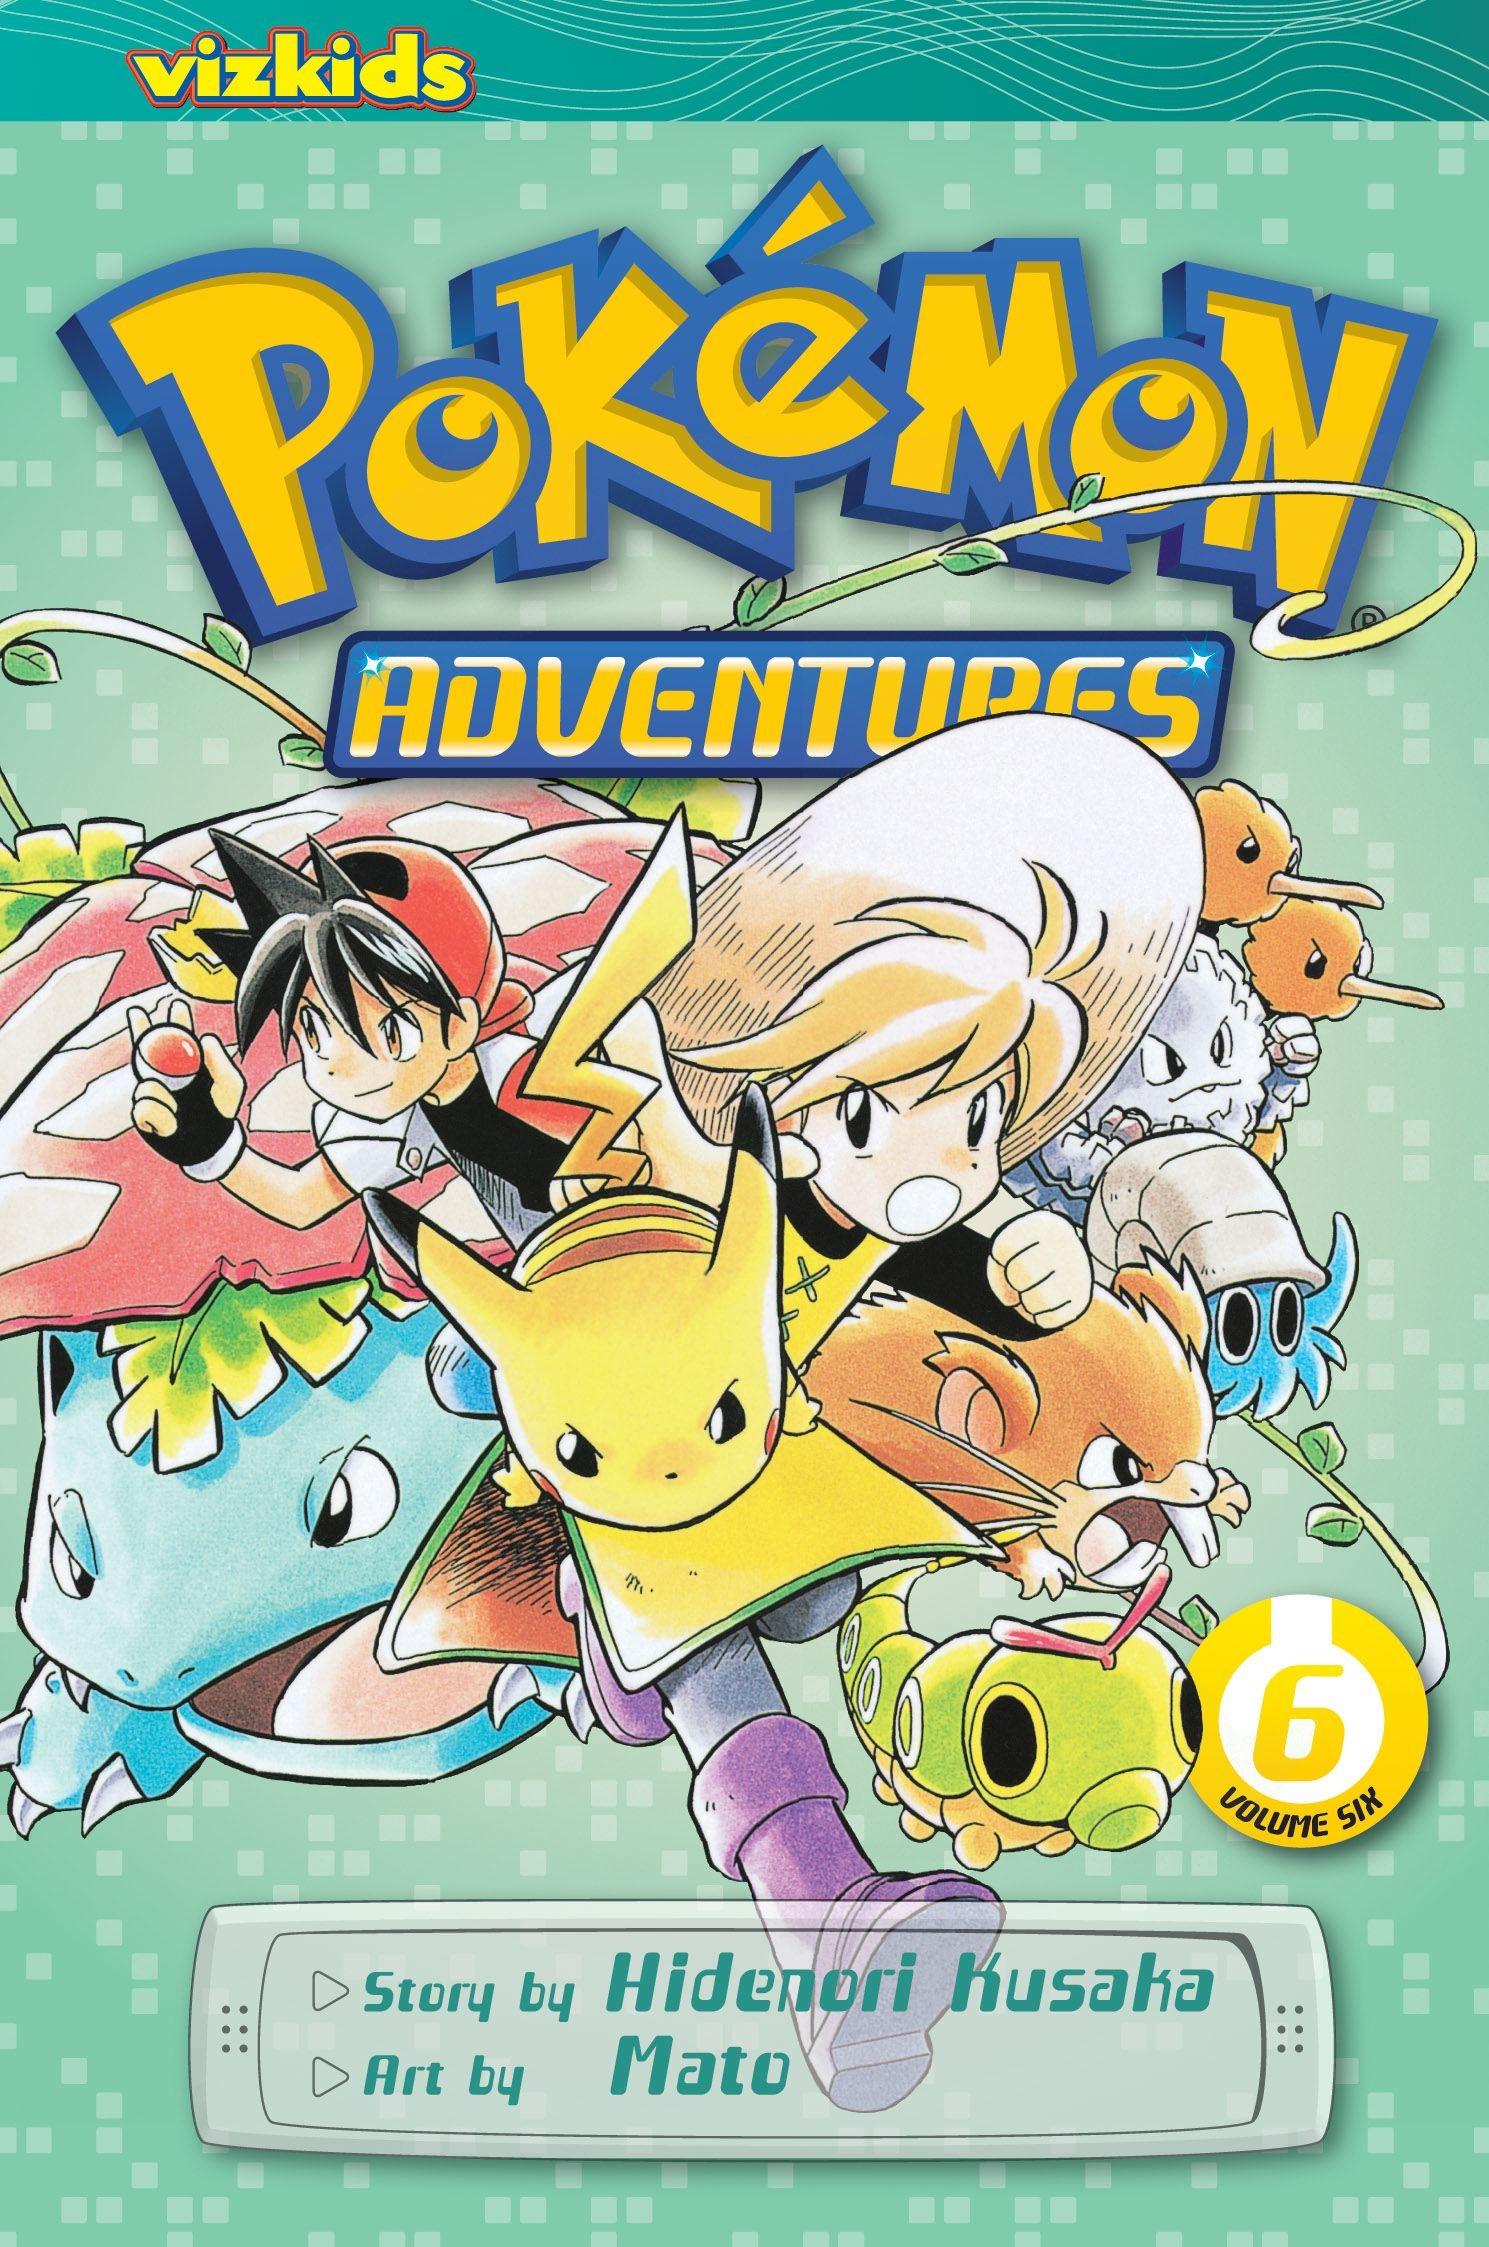 Pokémon Adventures, Vol. 6 (2nd Edition) by Hidenori Kusaka